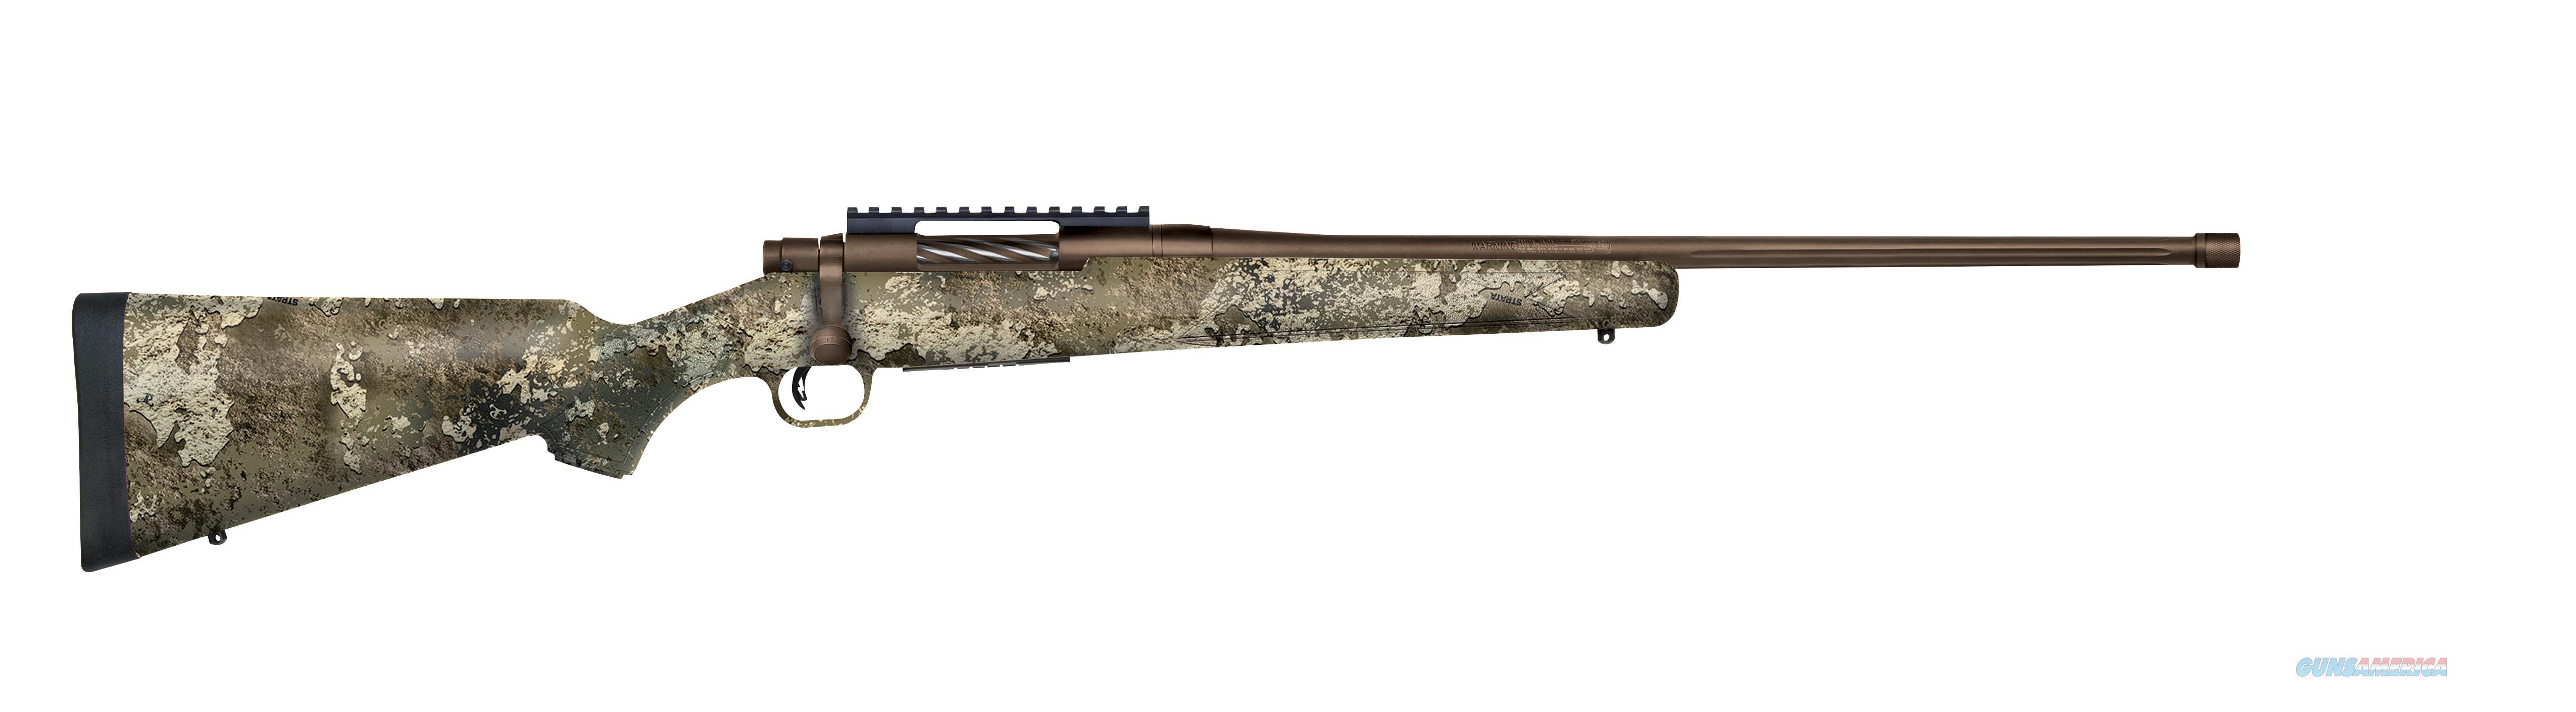 "Mossberg Patriot Predator 6.5 Creed Strata Camo 22"" Patriot Brown 28046  Guns > Rifles > Mossberg Rifles > Patriot"